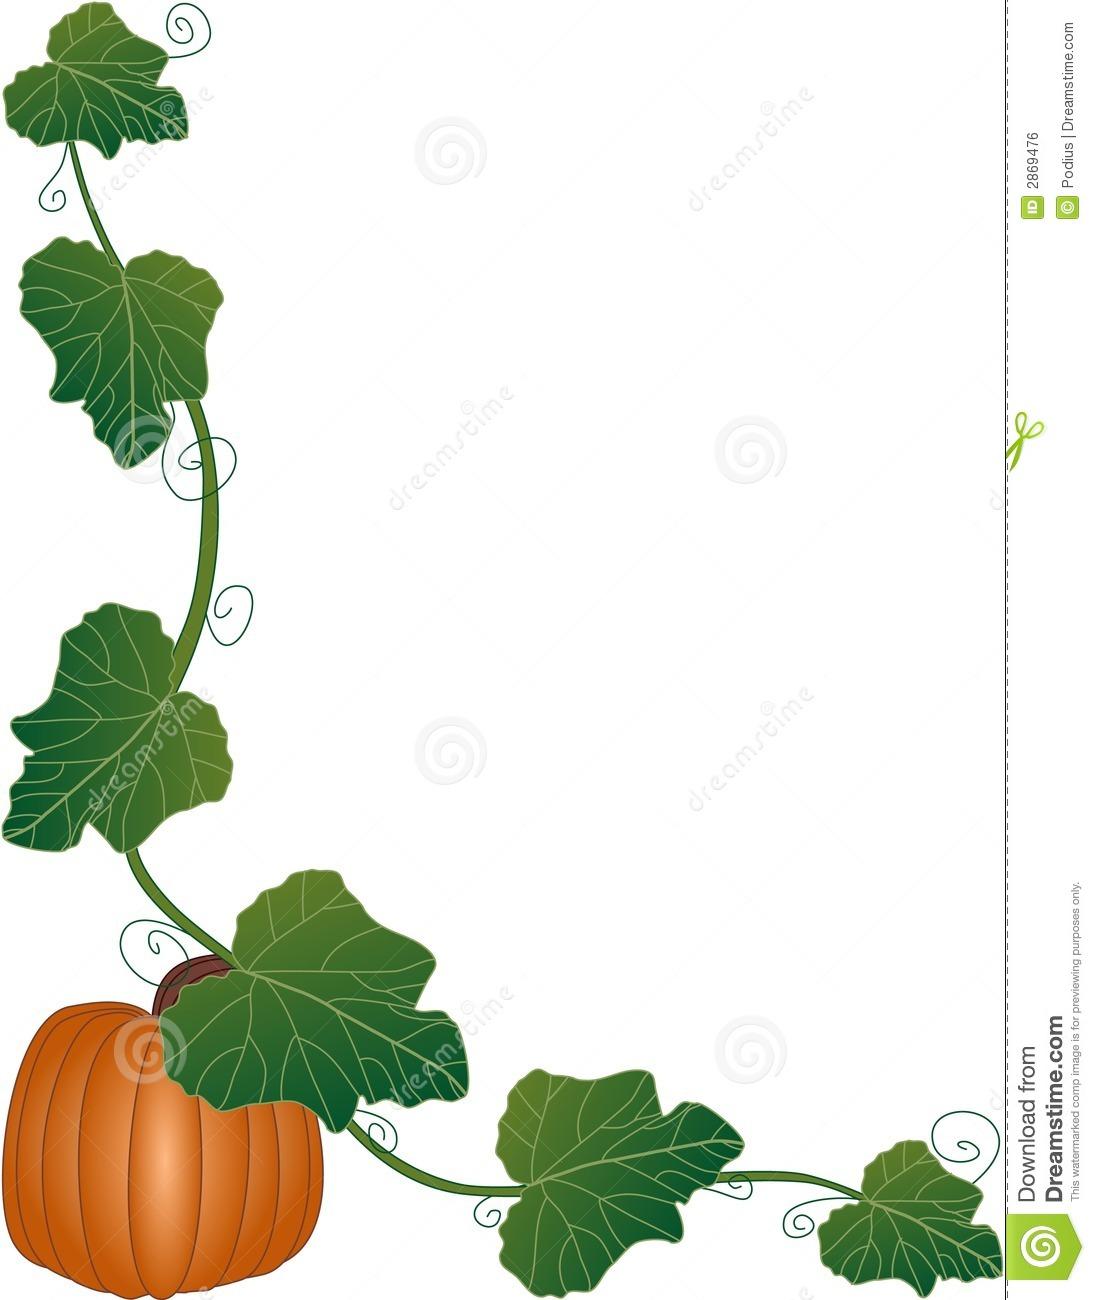 pumpkin vine clipart clipart panda free clipart images rh clipartpanda com pumpkin vine border clip art